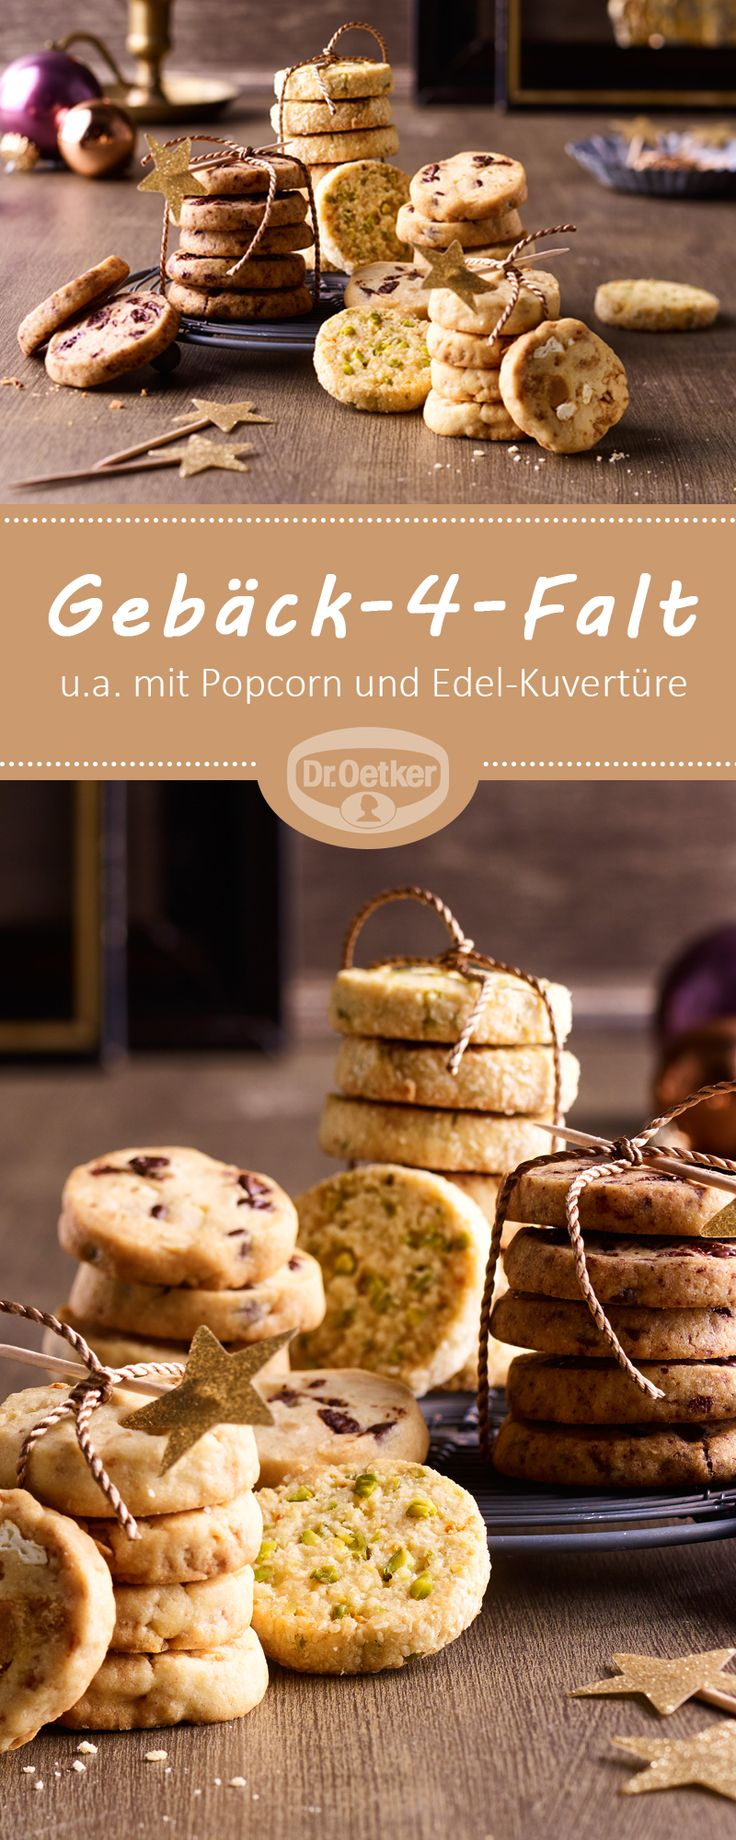 Gebäck-4-Falt: Mürbe Kekse mit Popcorn, Edel-Kuvertüre, Salz-Erdnüssen und Kokos-Orange